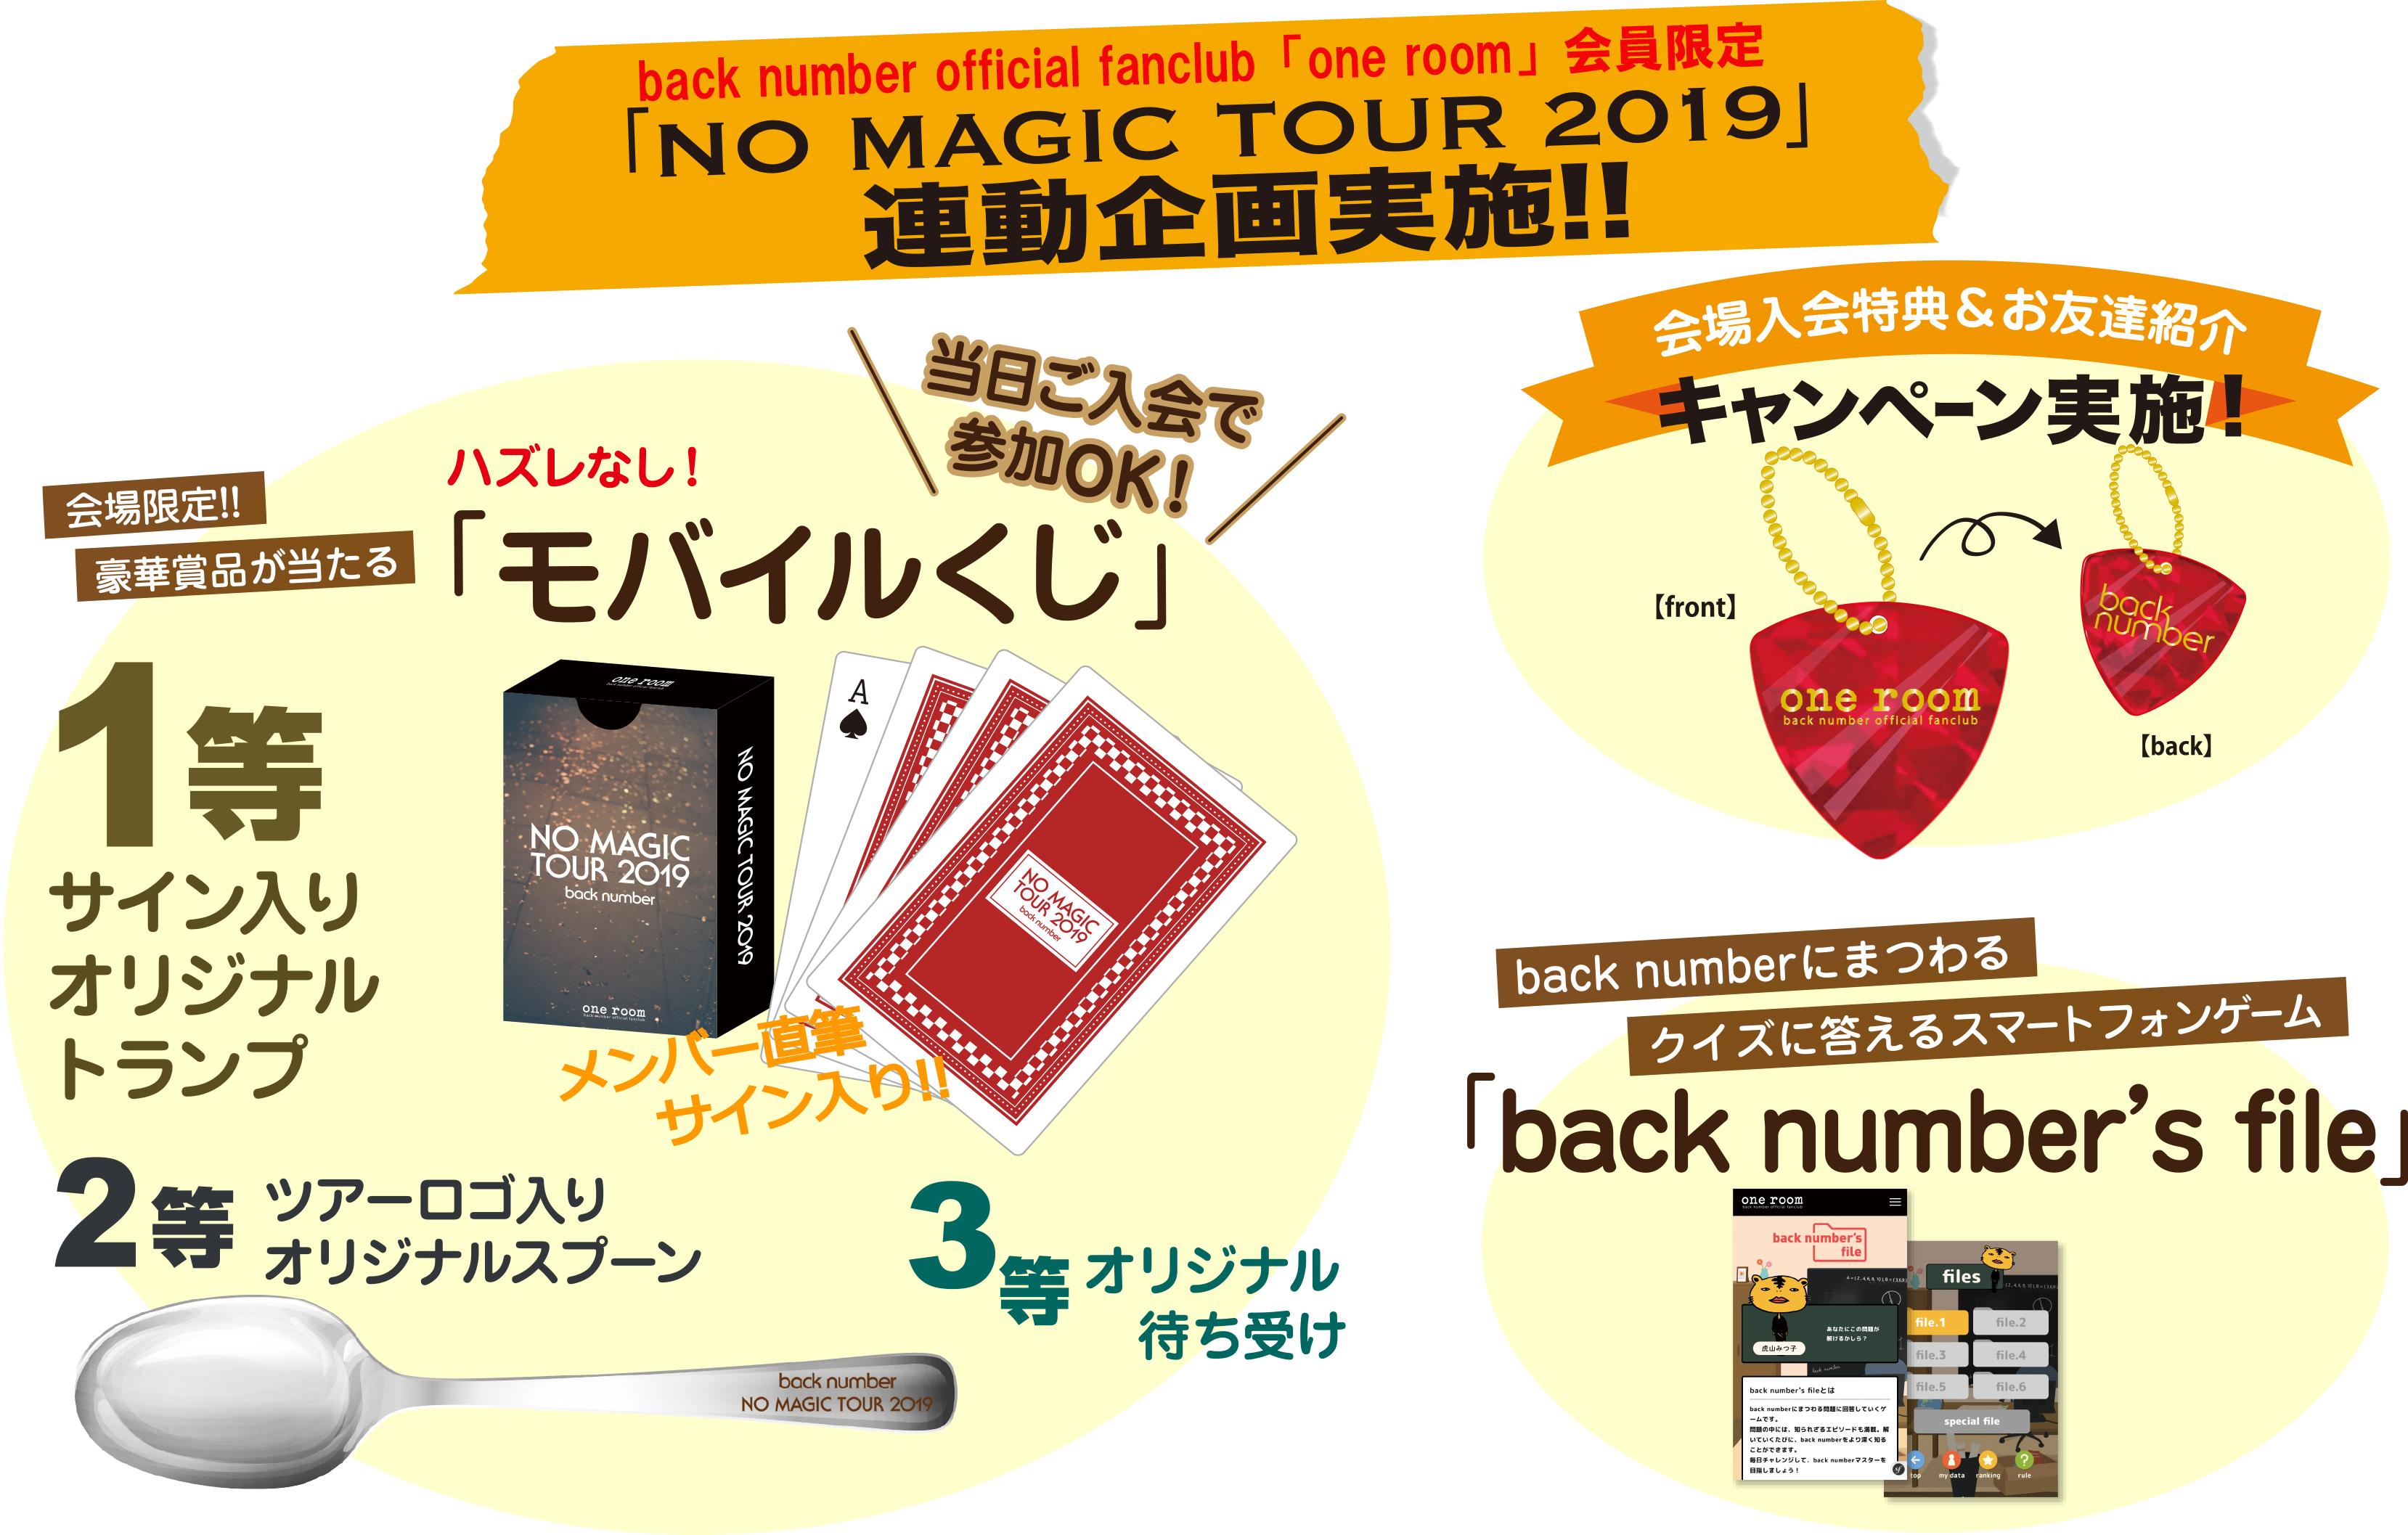 one room会員限定「NO MAGIC TOUR 2019」連動企画!